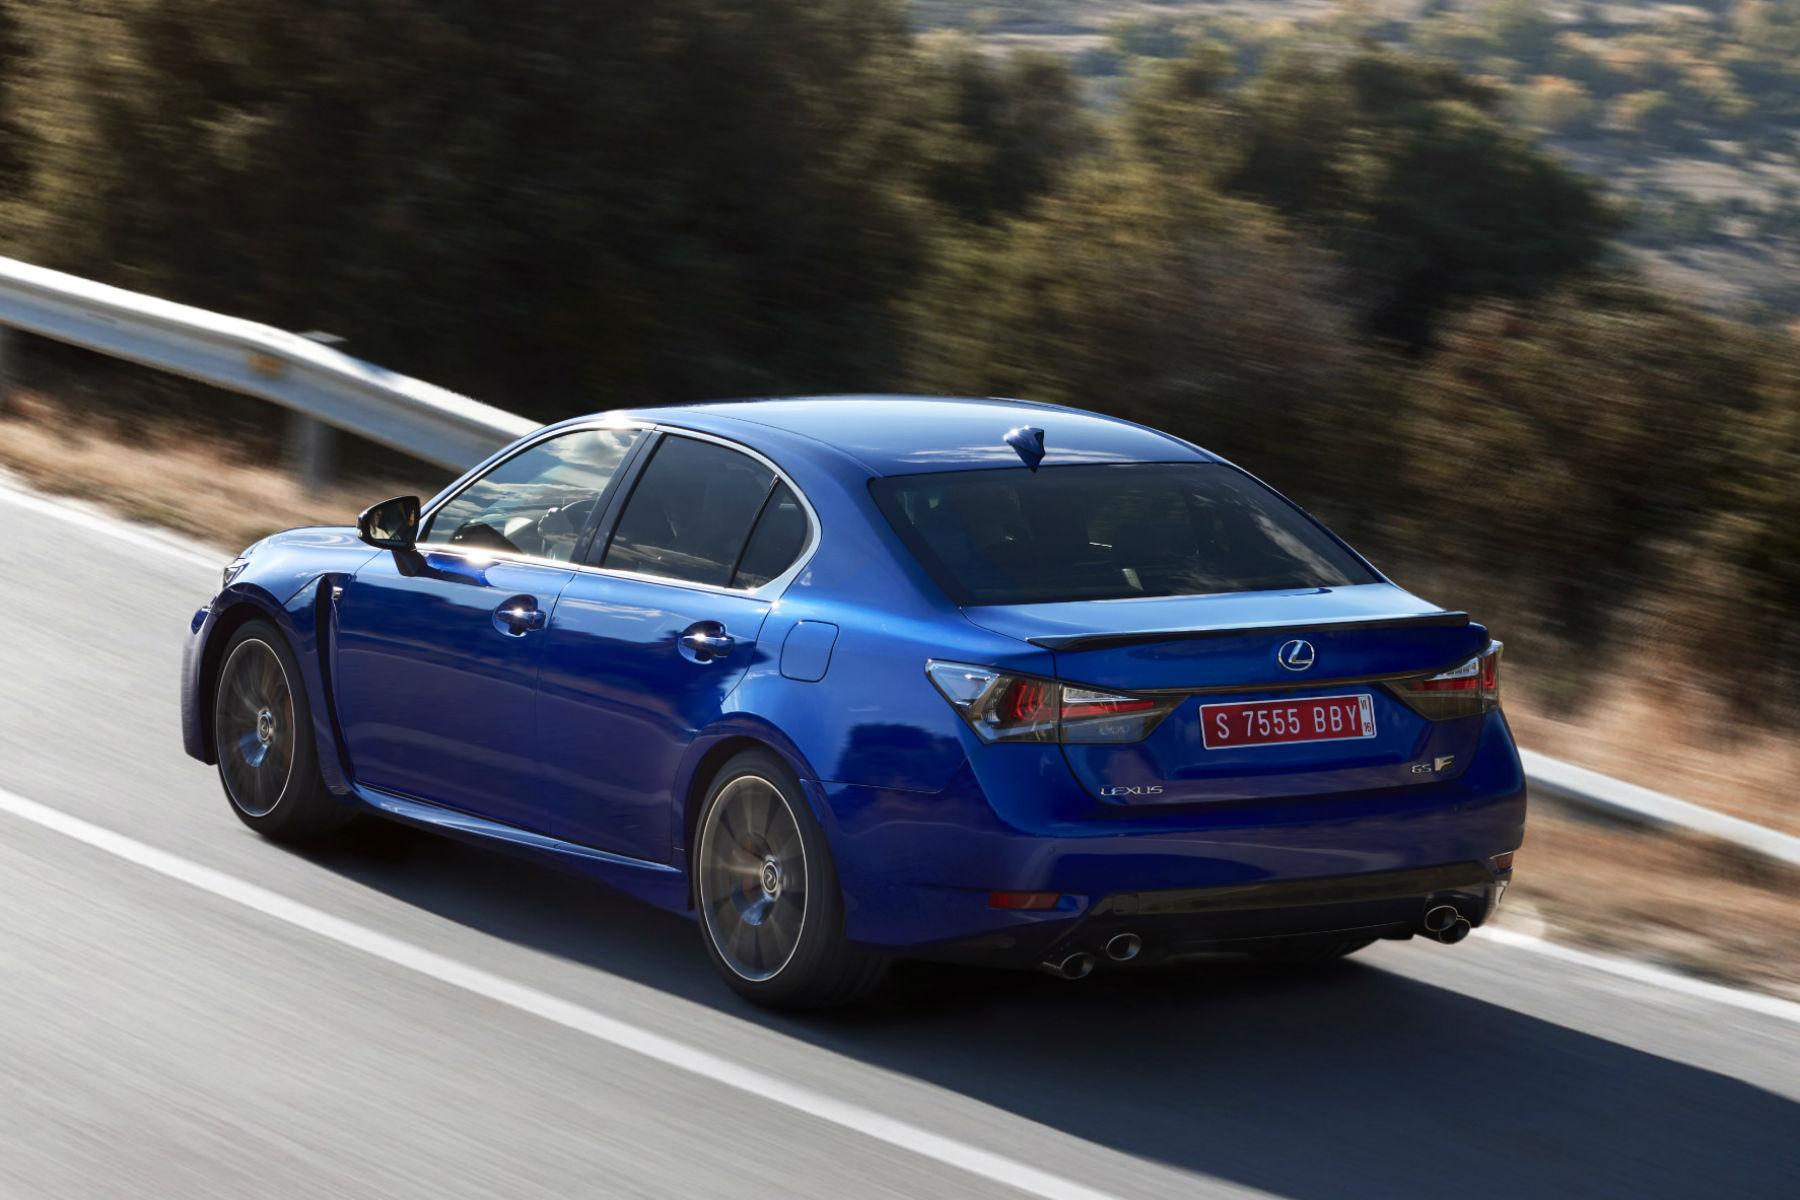 Lexus_GS-F_Blue_09